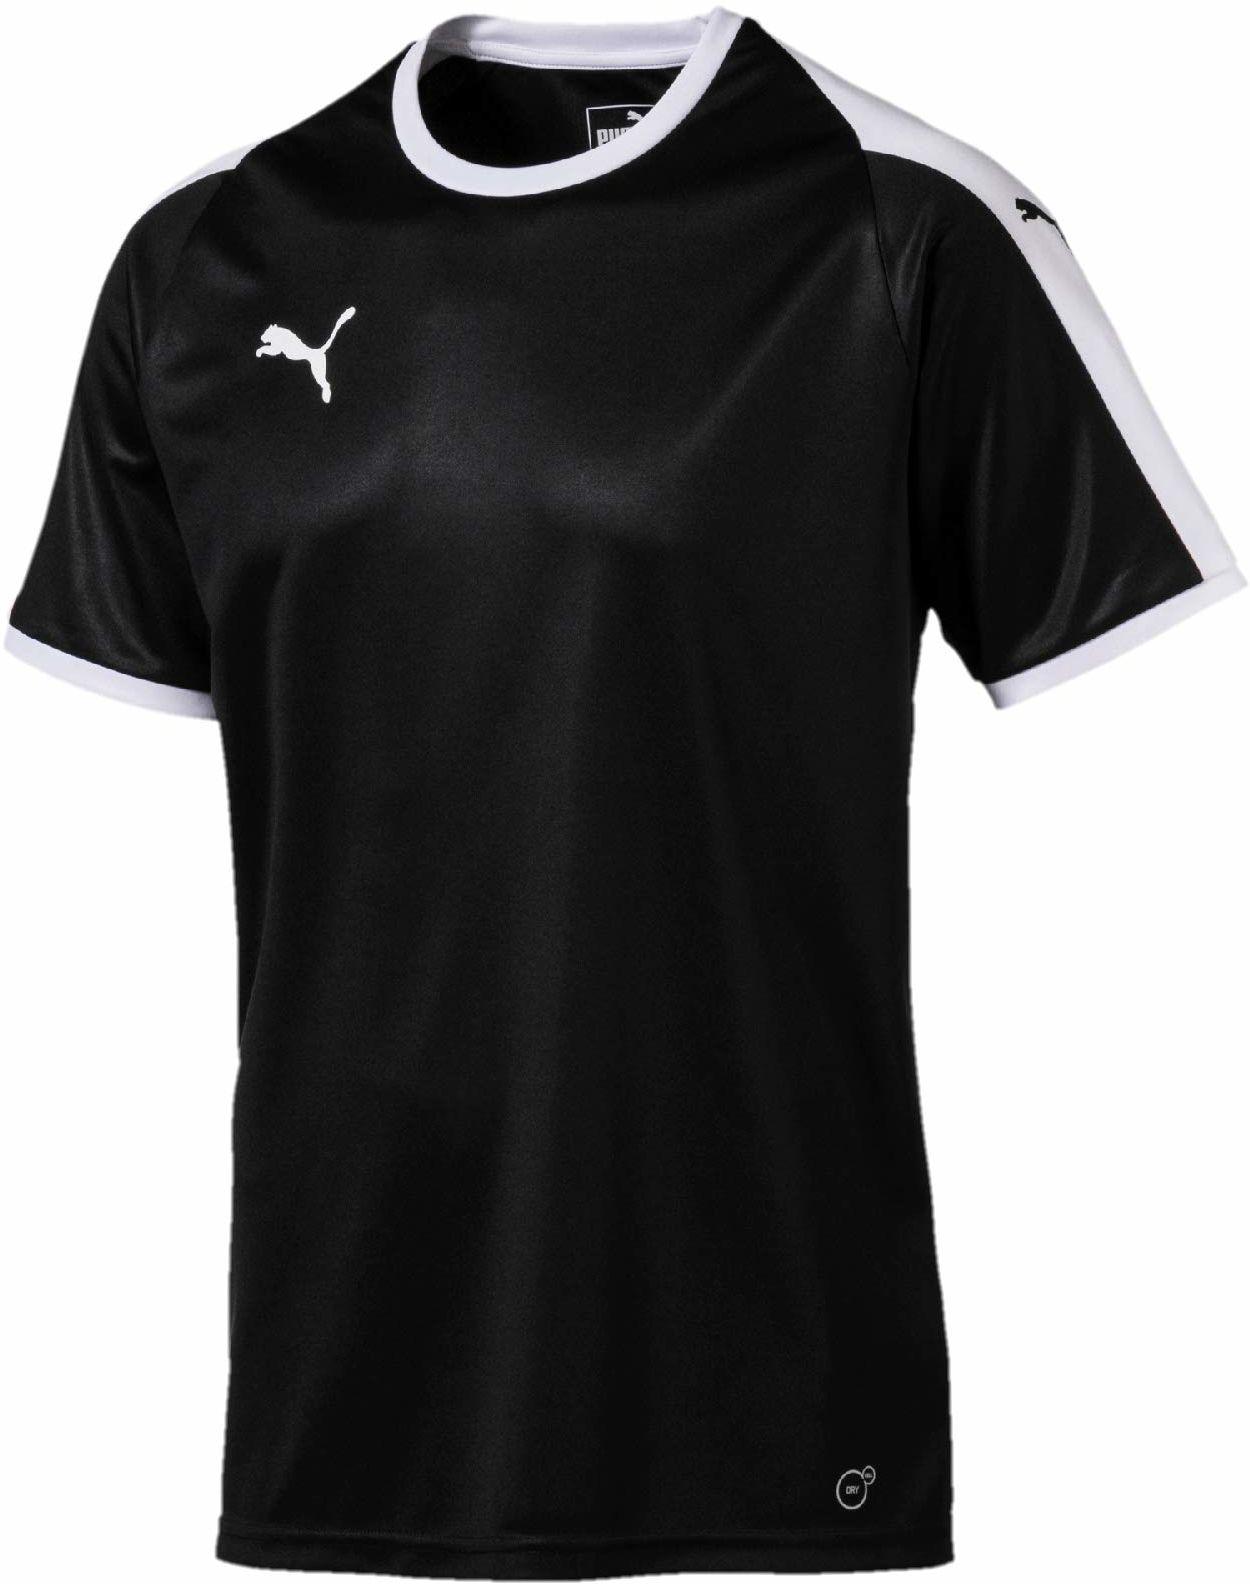 Puma Liga Jersey Jersey Jersey czarny Puma Black-puma White L